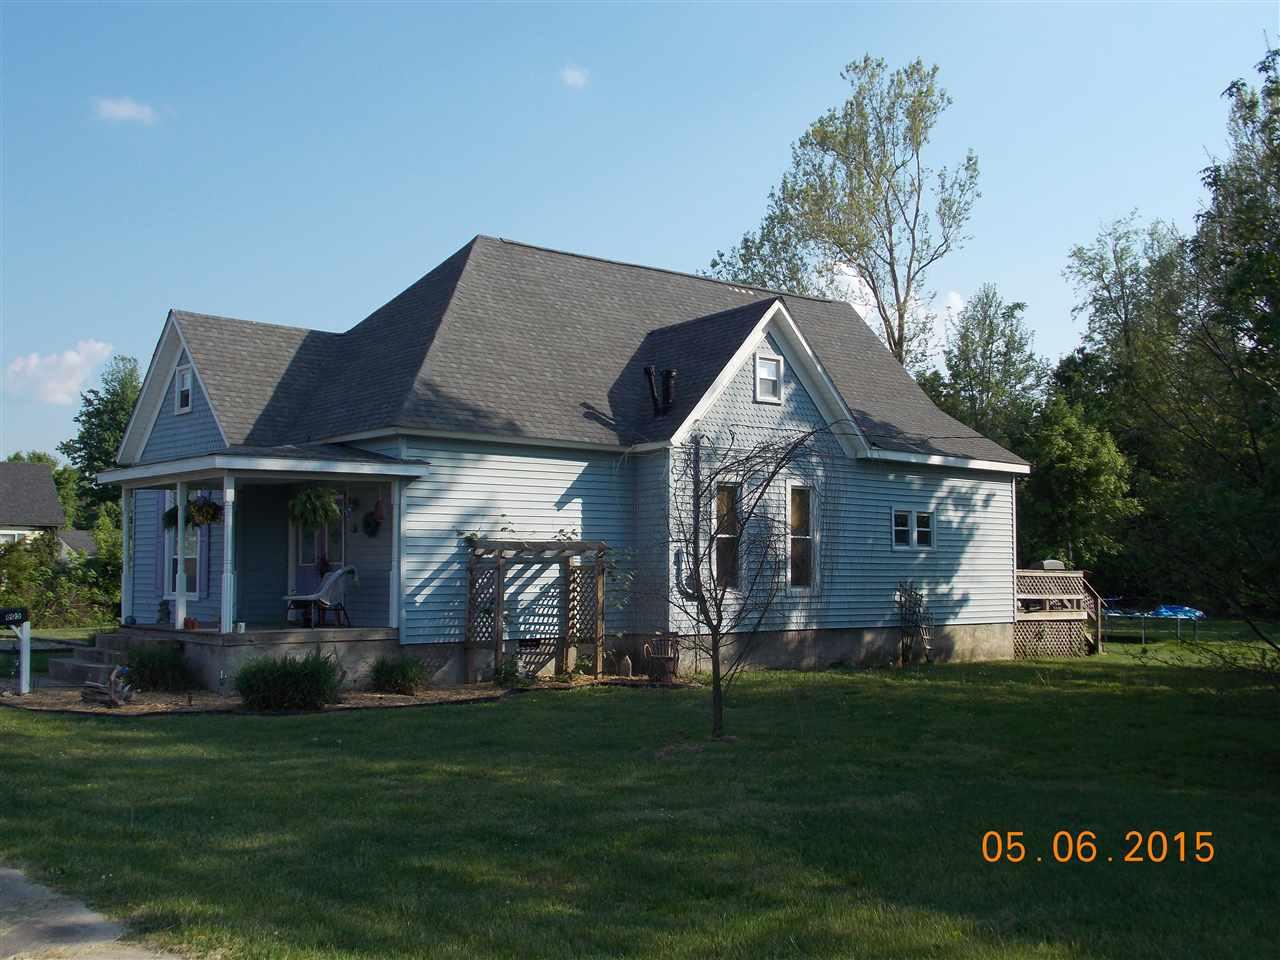 Real Estate for Sale, ListingId: 31855387, Earlington,KY42410